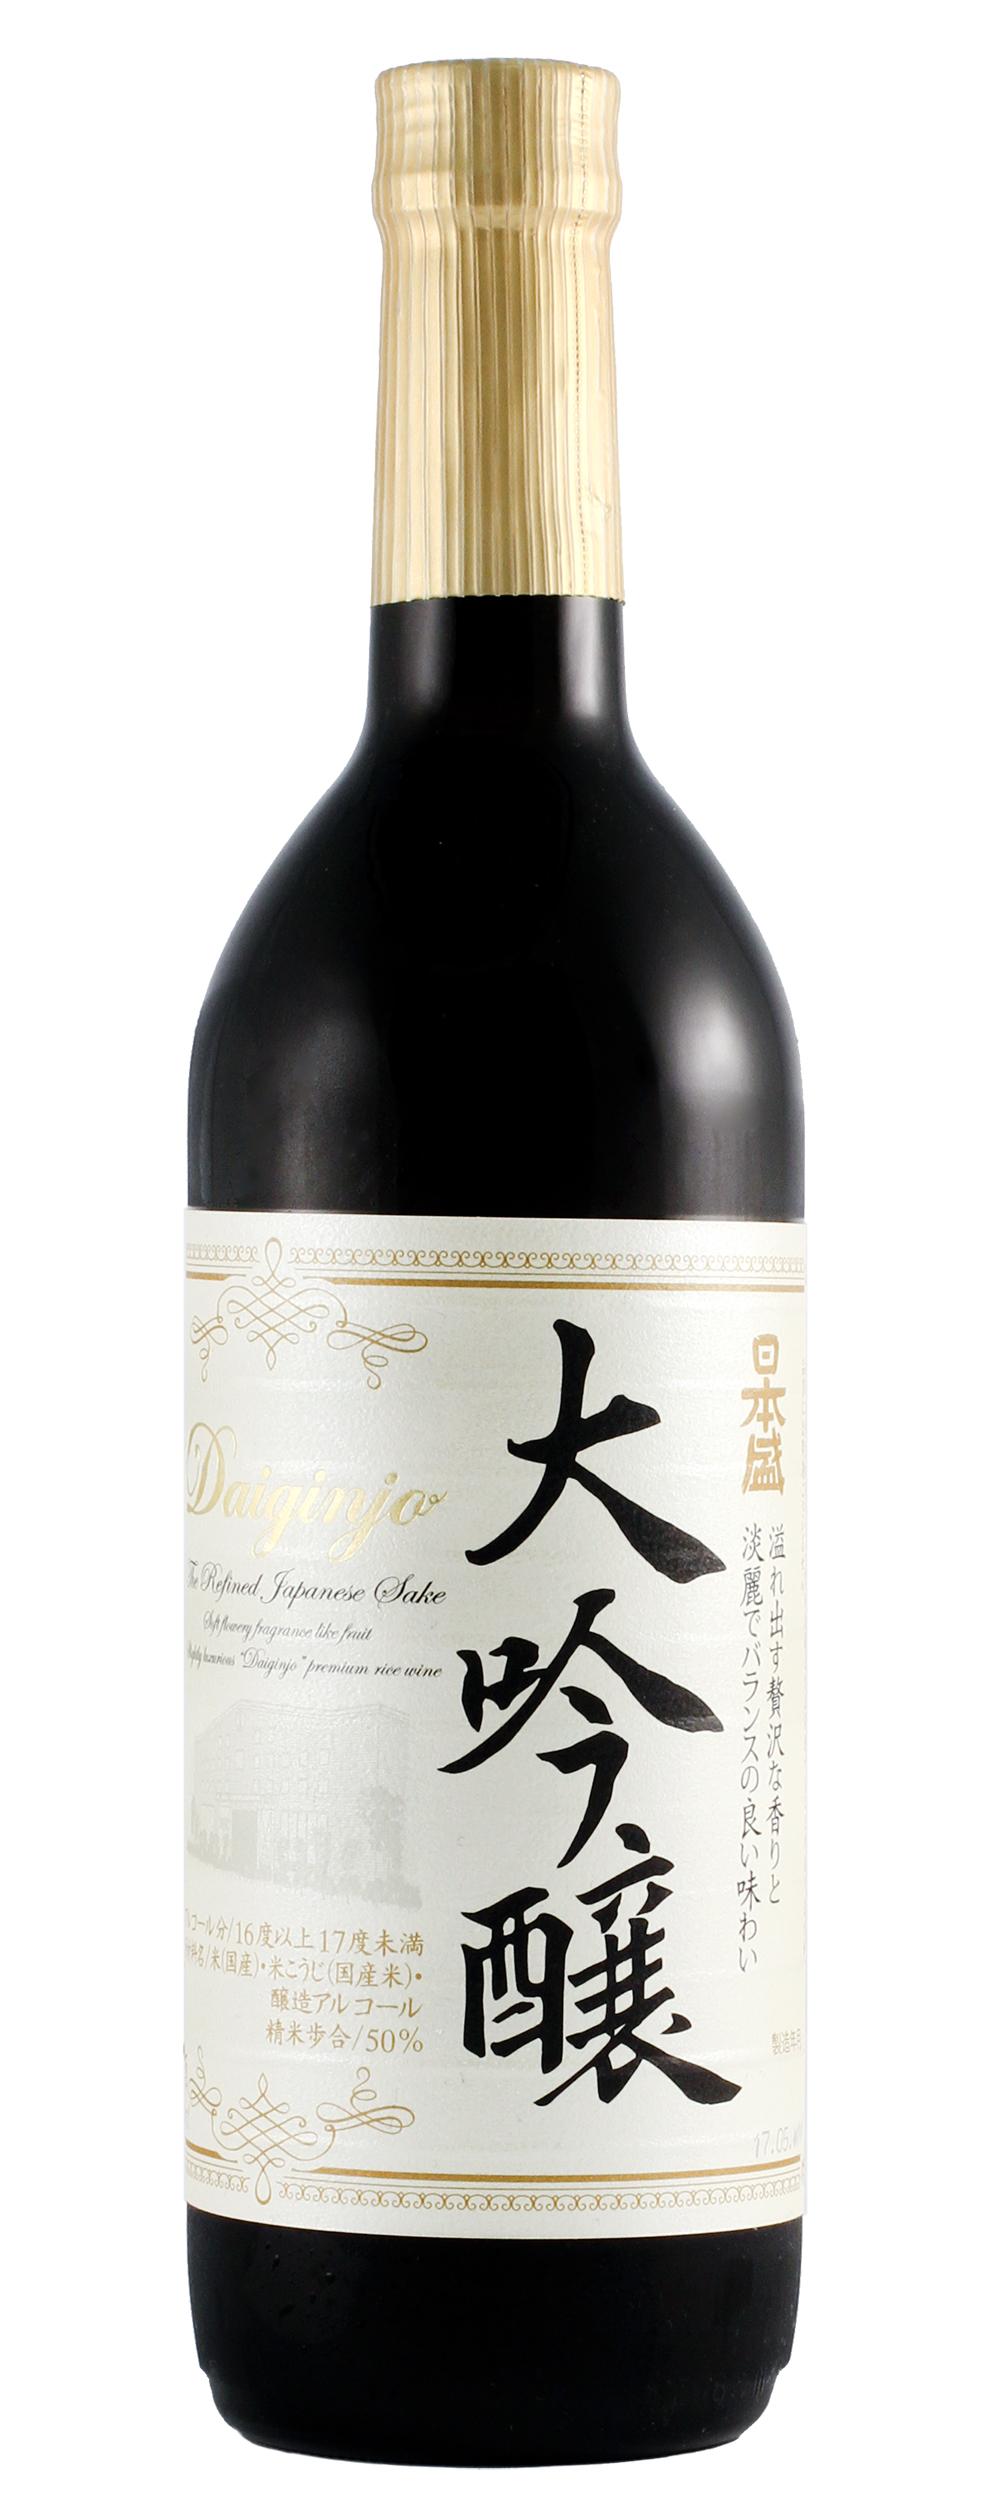 Nihonsakari Daiginjo